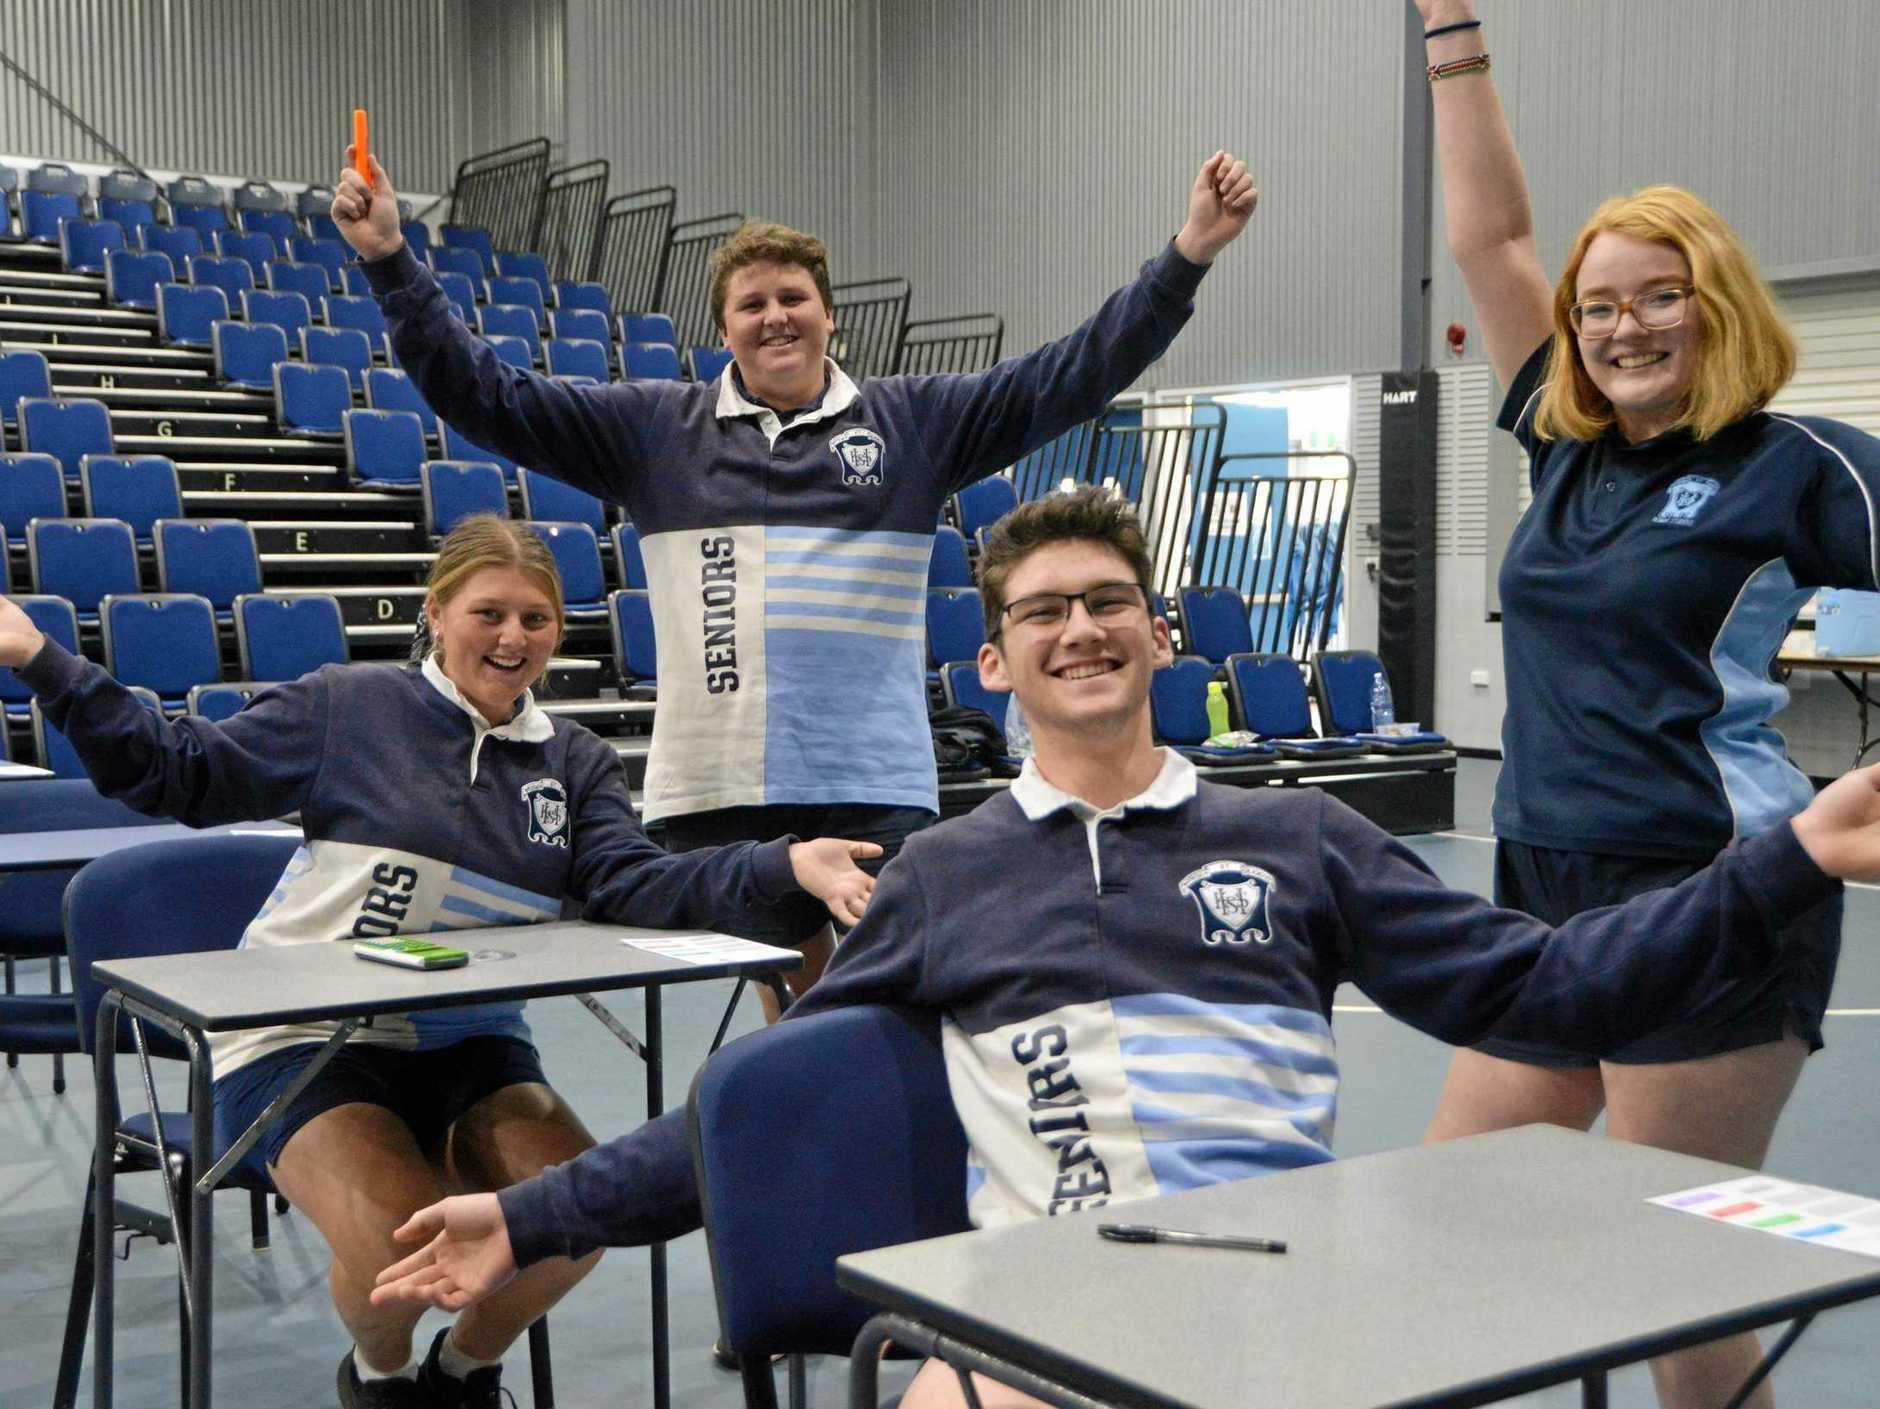 Kingaroy State High School students Xanthe Walker, Jake Sullivan, Jordan Buckley and Brenna Prendergast celebrate the end of the Queensland Core Skills Test.